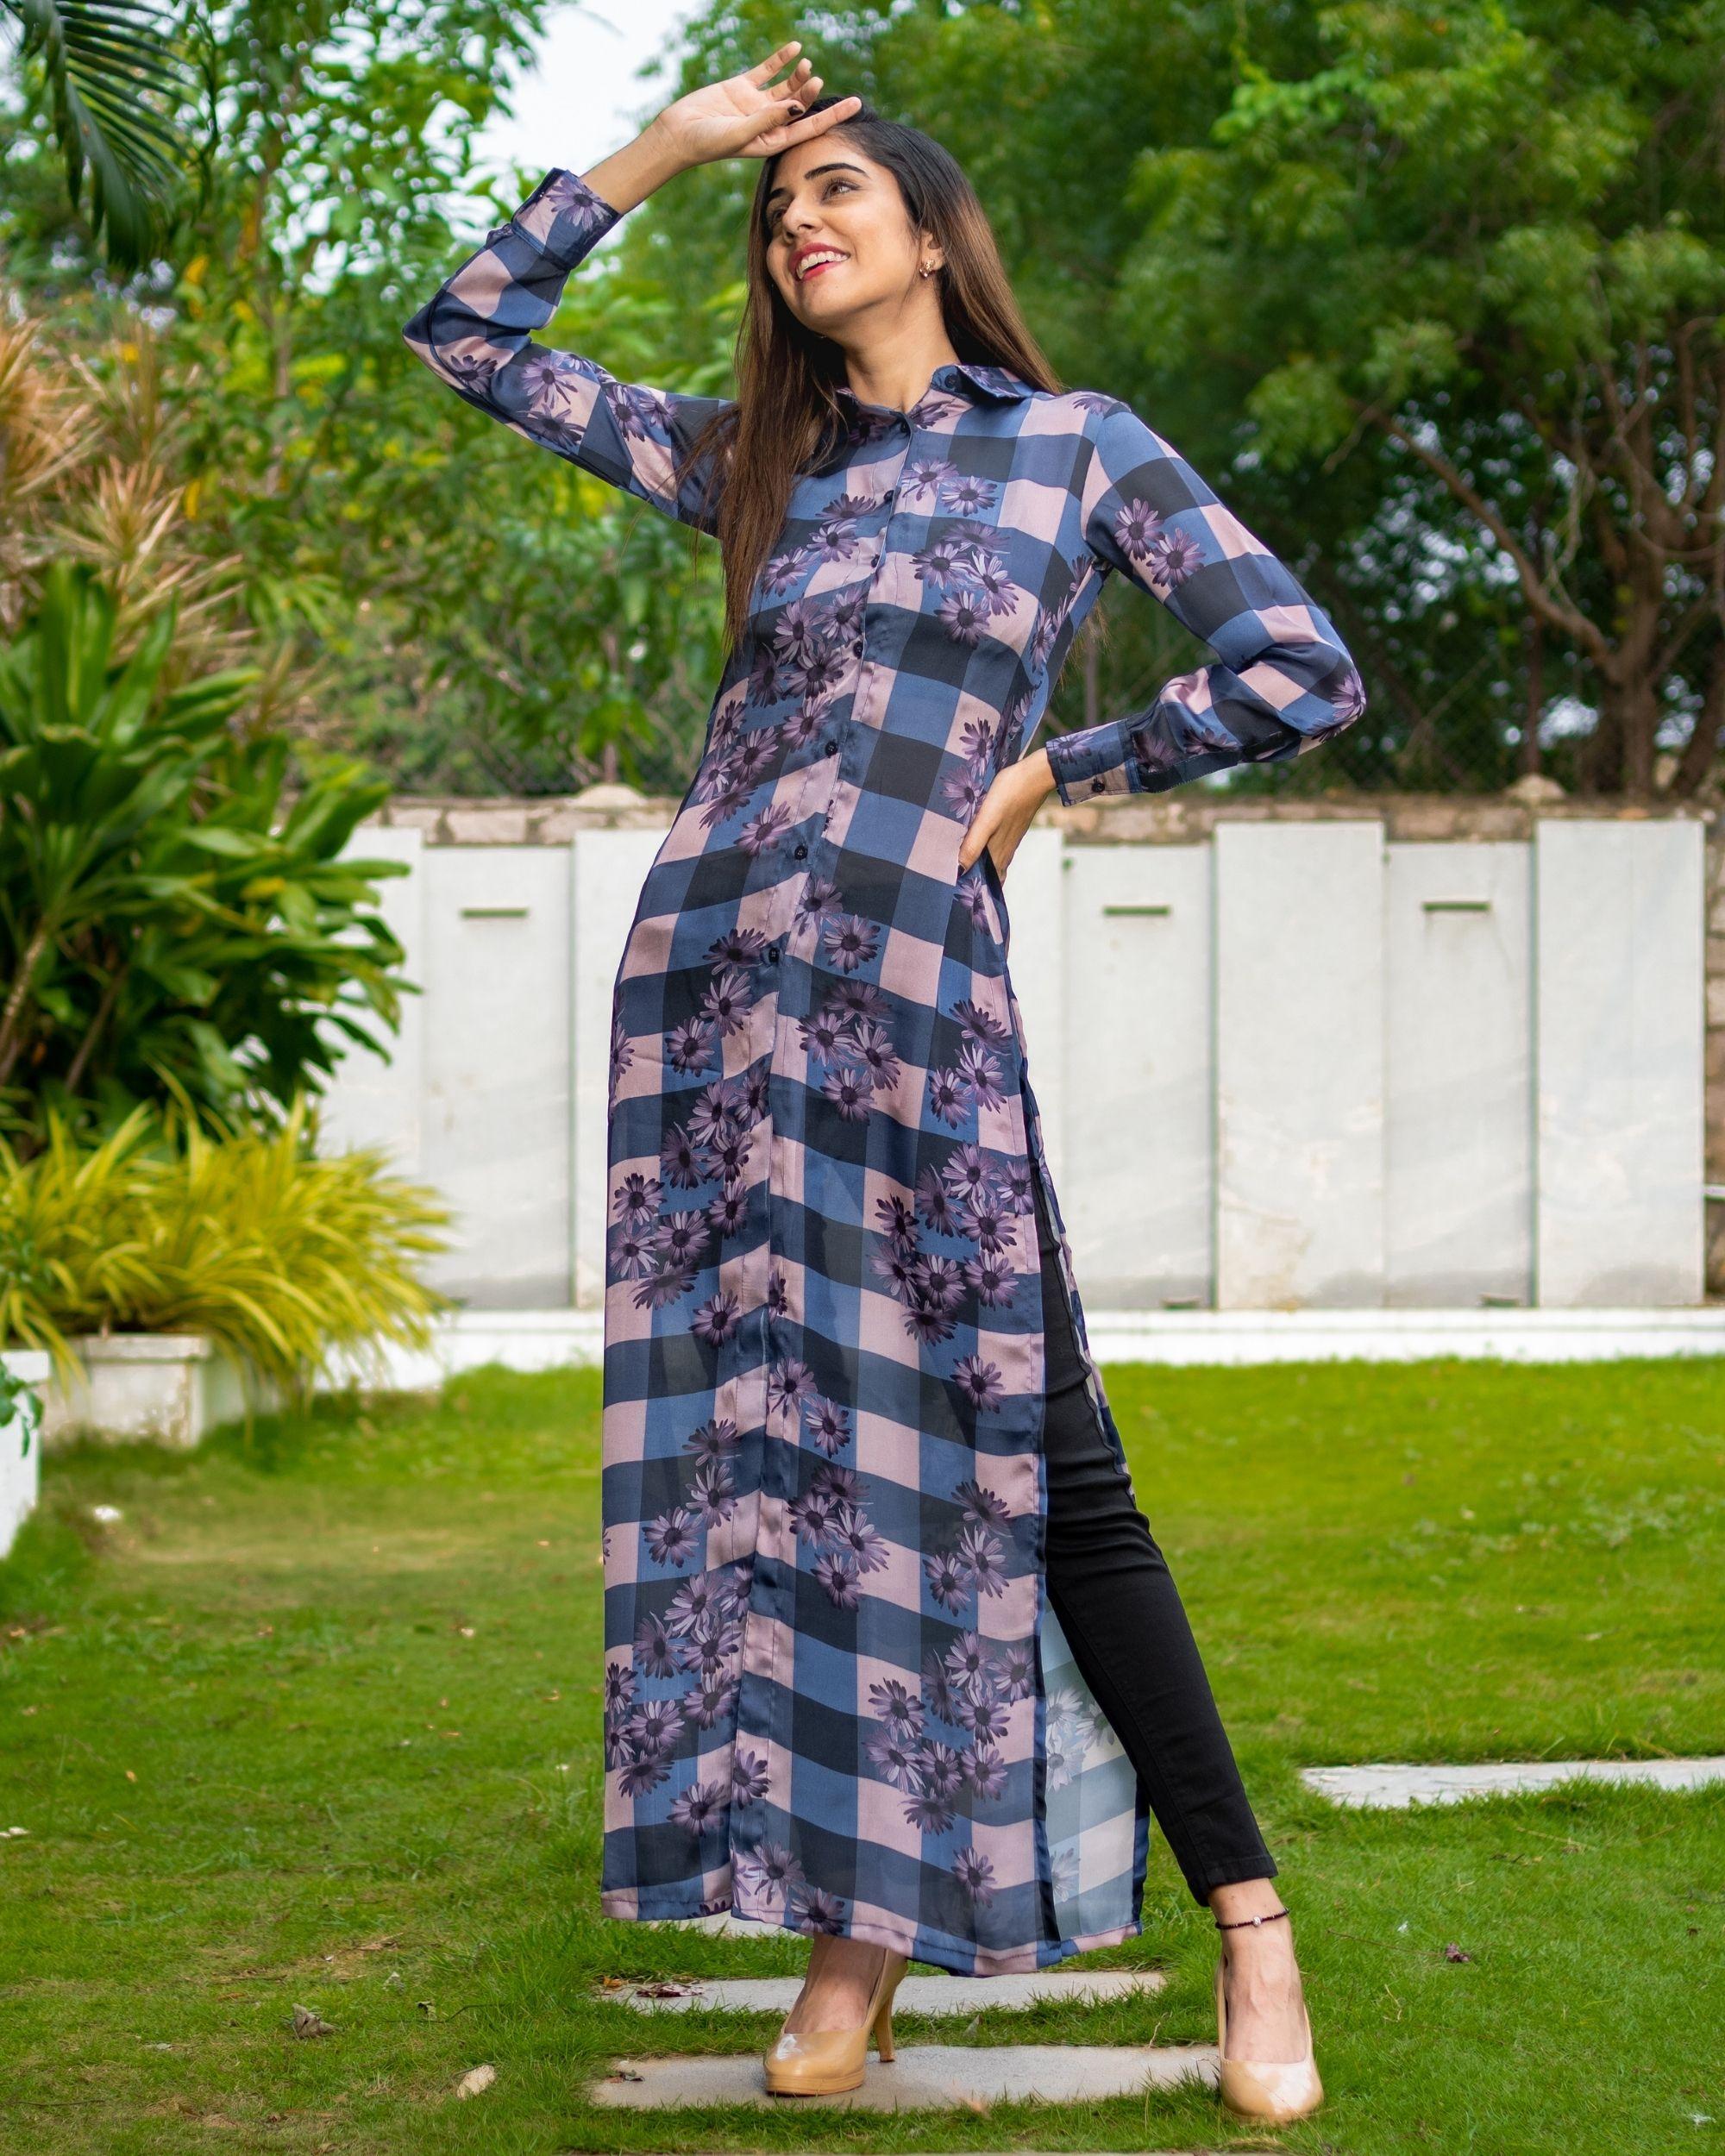 Blue and black checks printed slit dress